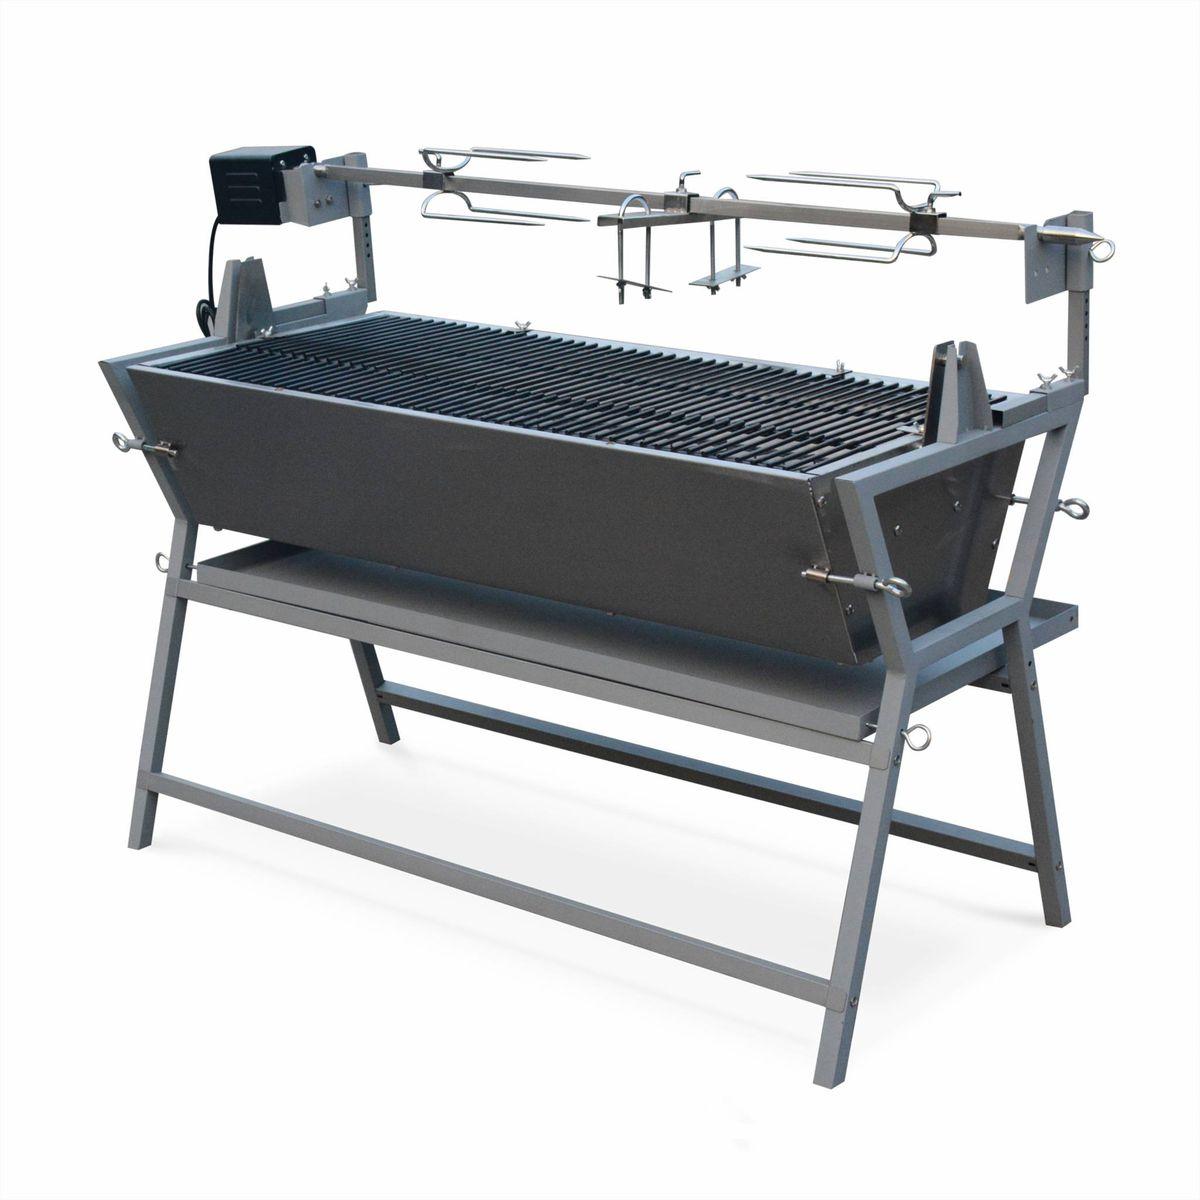 barbecue avec tournebroche achat vente barbecue avec tournebroche pas cher soldes d s le. Black Bedroom Furniture Sets. Home Design Ideas